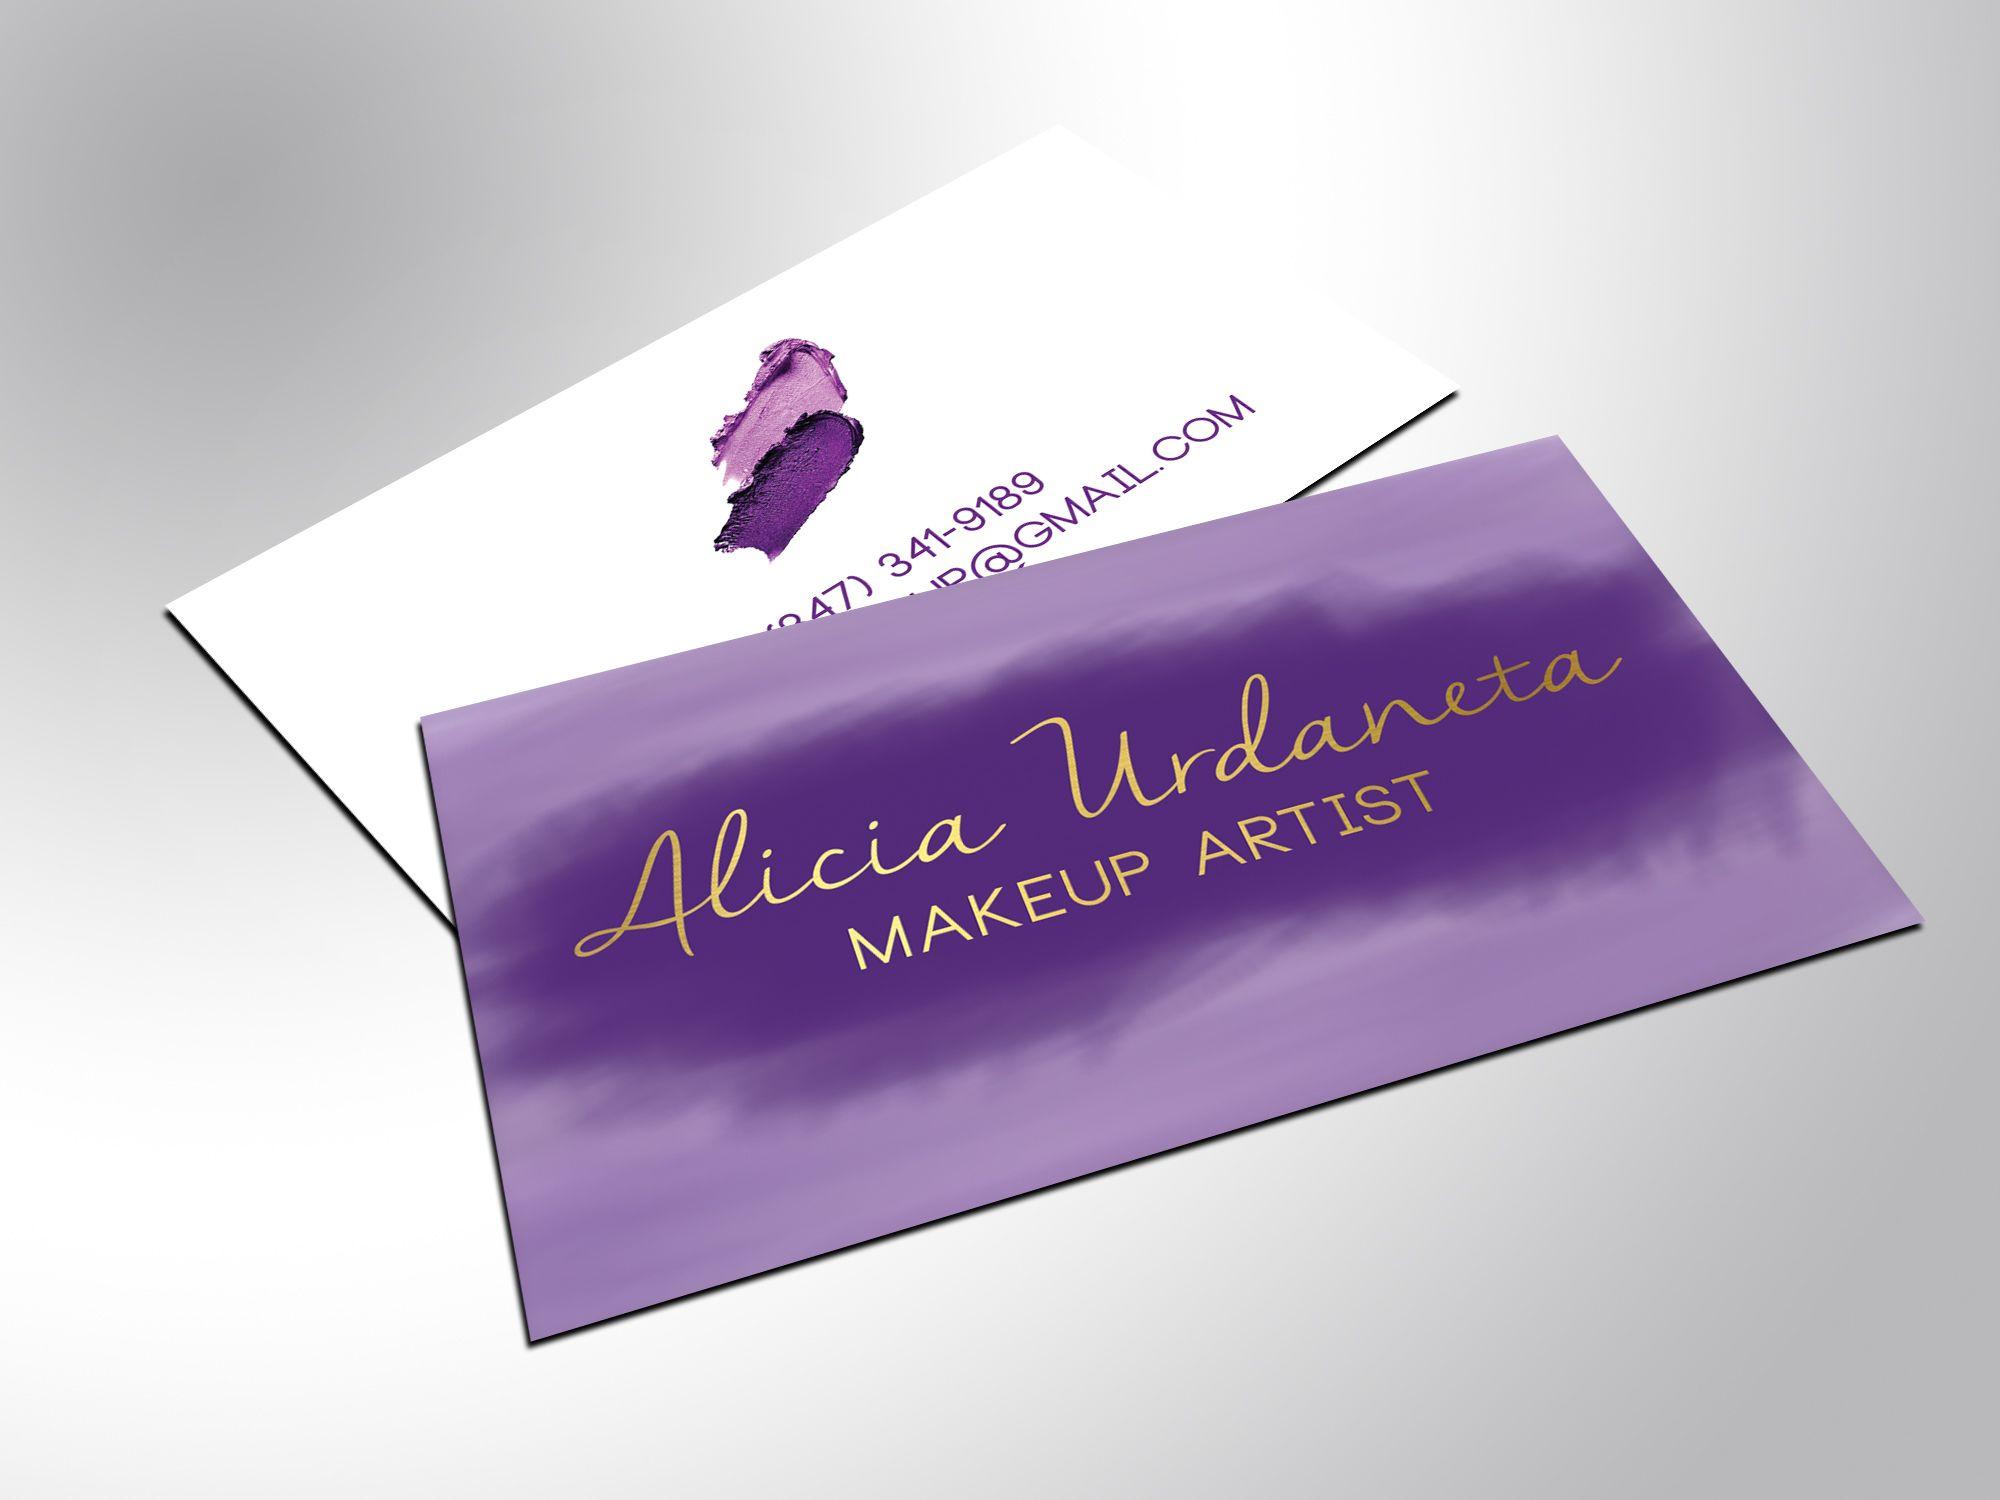 Gold Foil Business Cards Foil Business Cards Gold Foil Business Cards Printing Business Cards